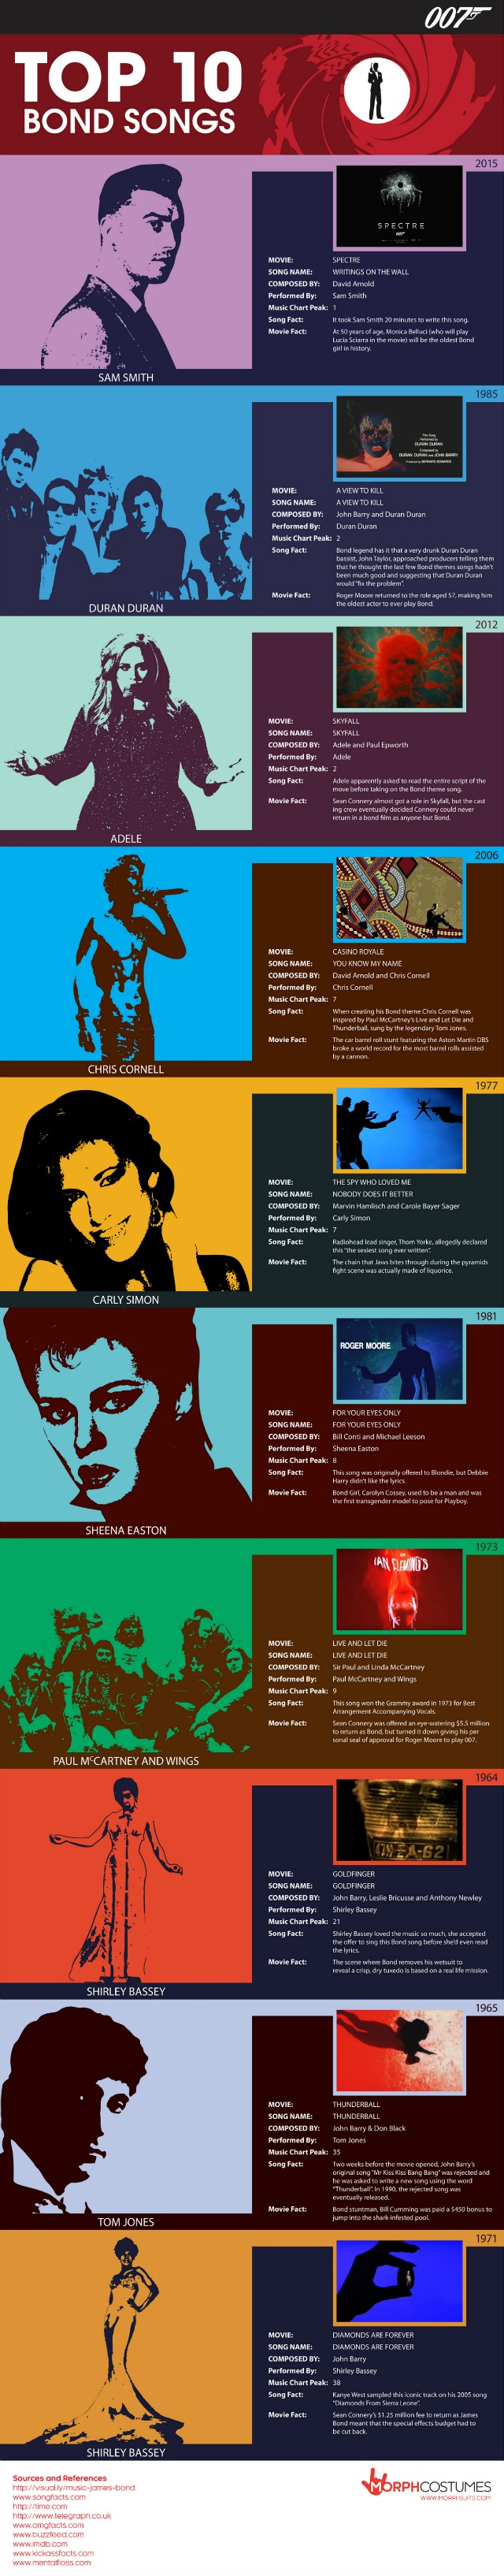 Bond-Songs-infographic